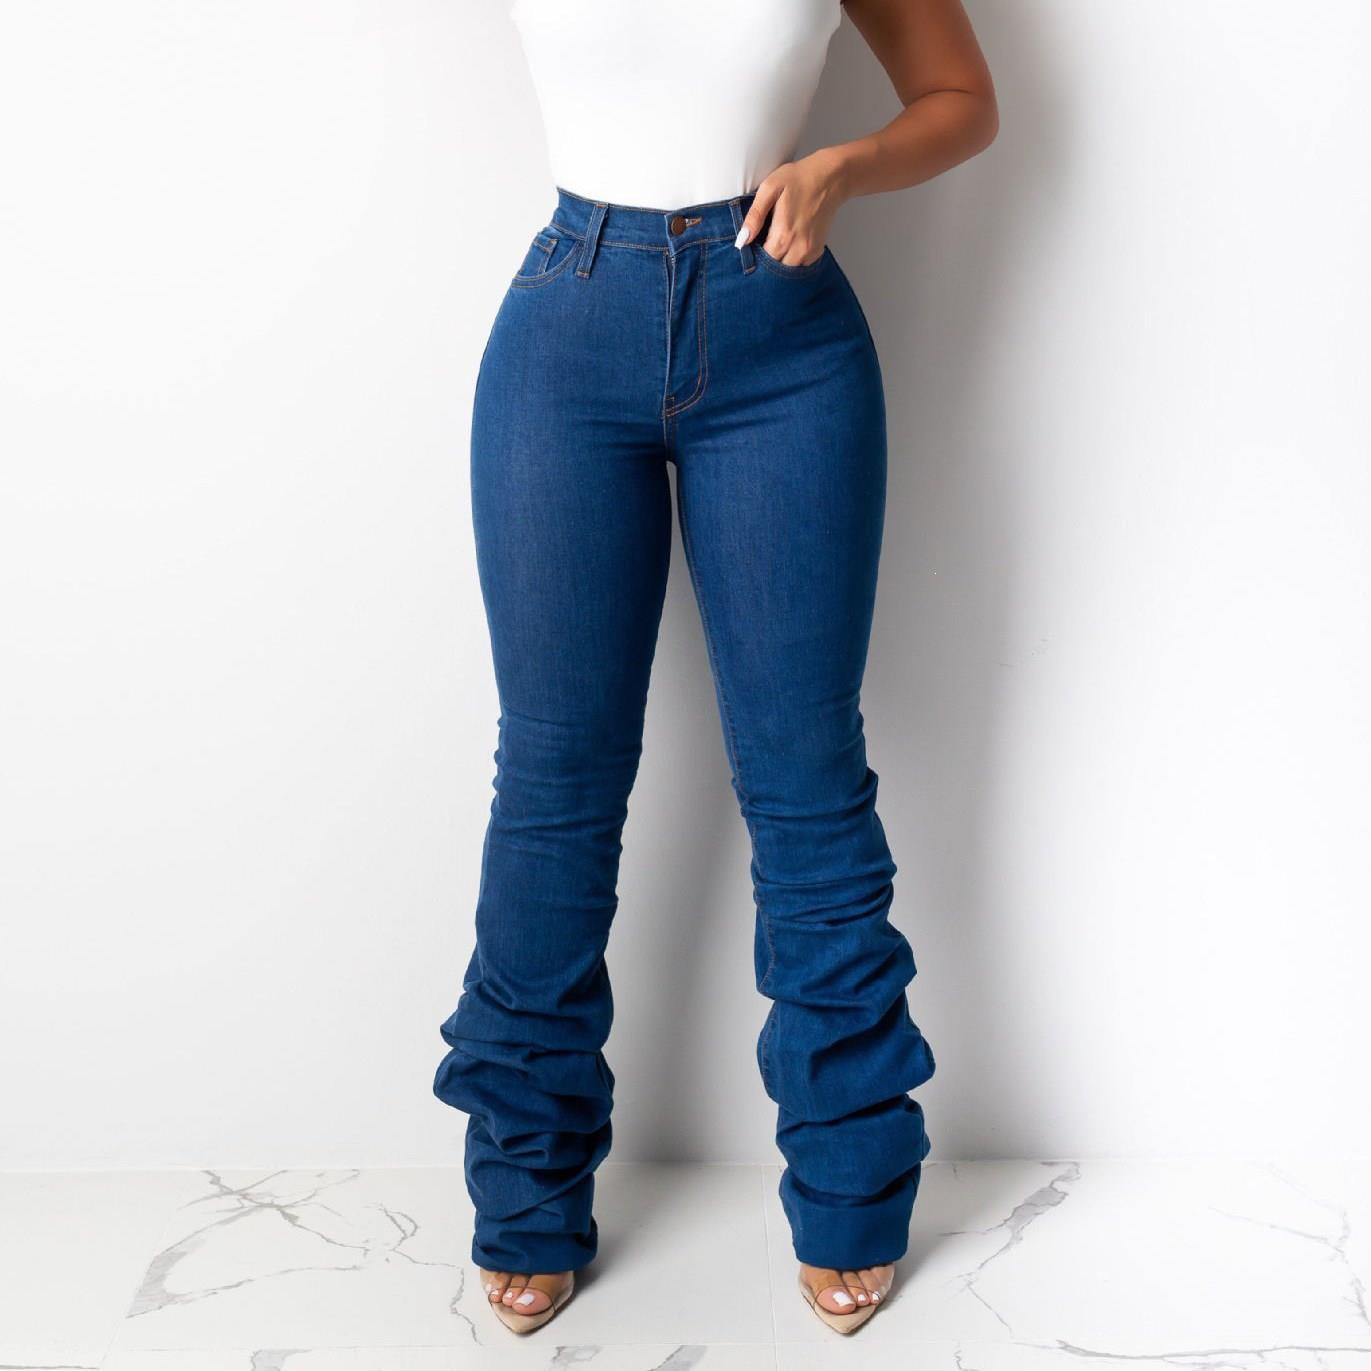 Newest Women Blue Heap Heap Jeans Pleated Autumn Winter Fashion Styles High Waist Pockets Skinny Denim Pants